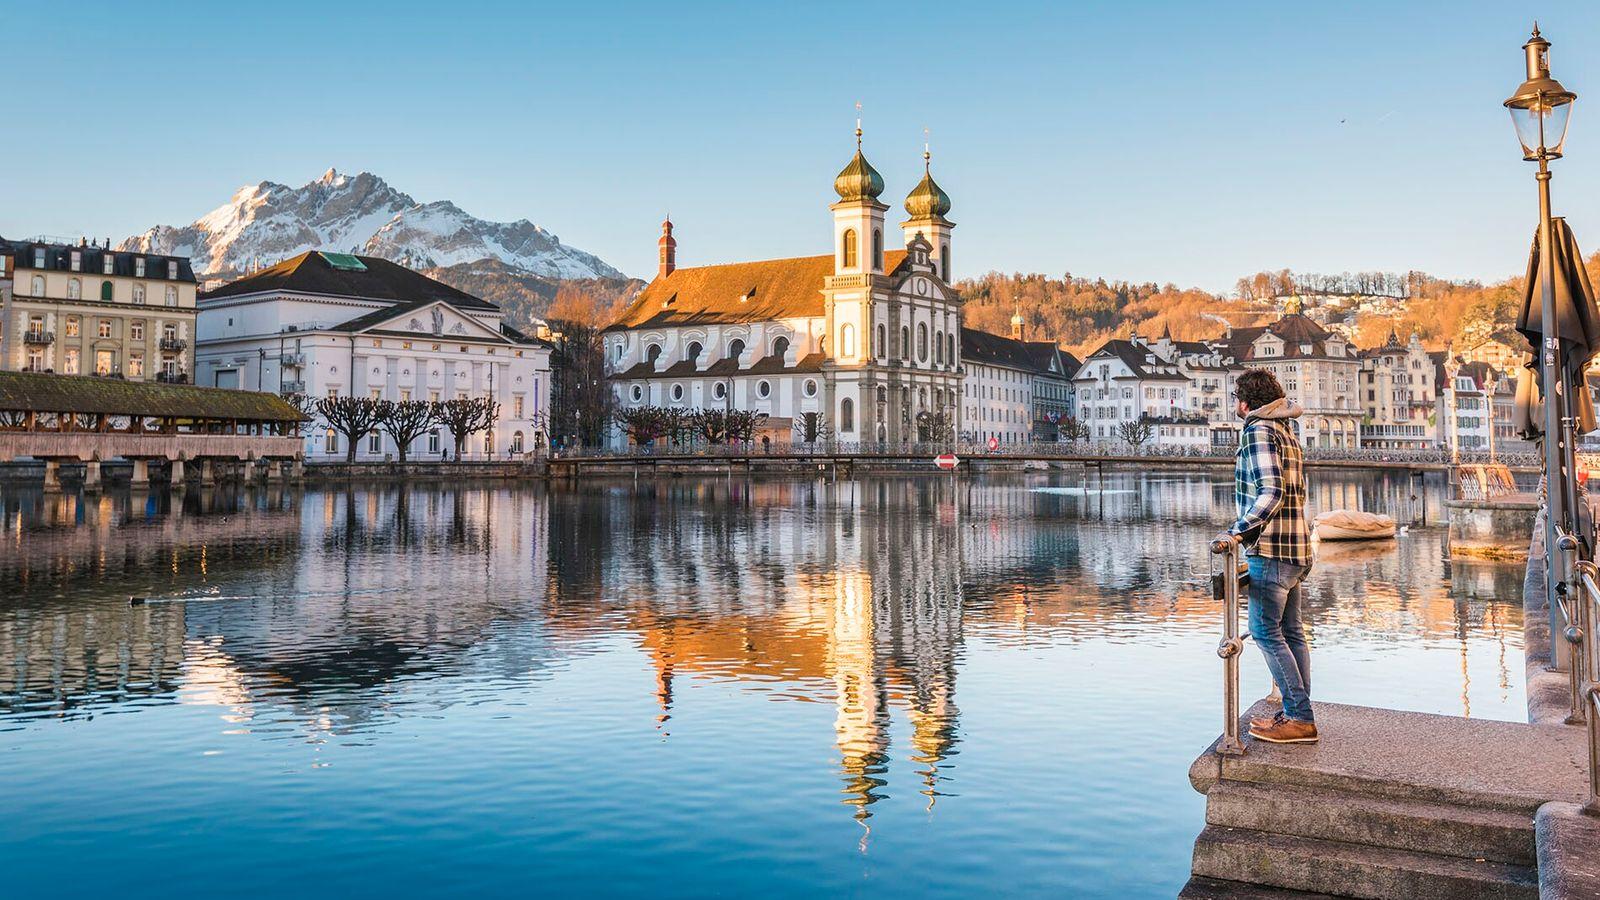 Lucerne has a beautiful medieval bridge, belle époque hotels and a piercingly blue central lake.